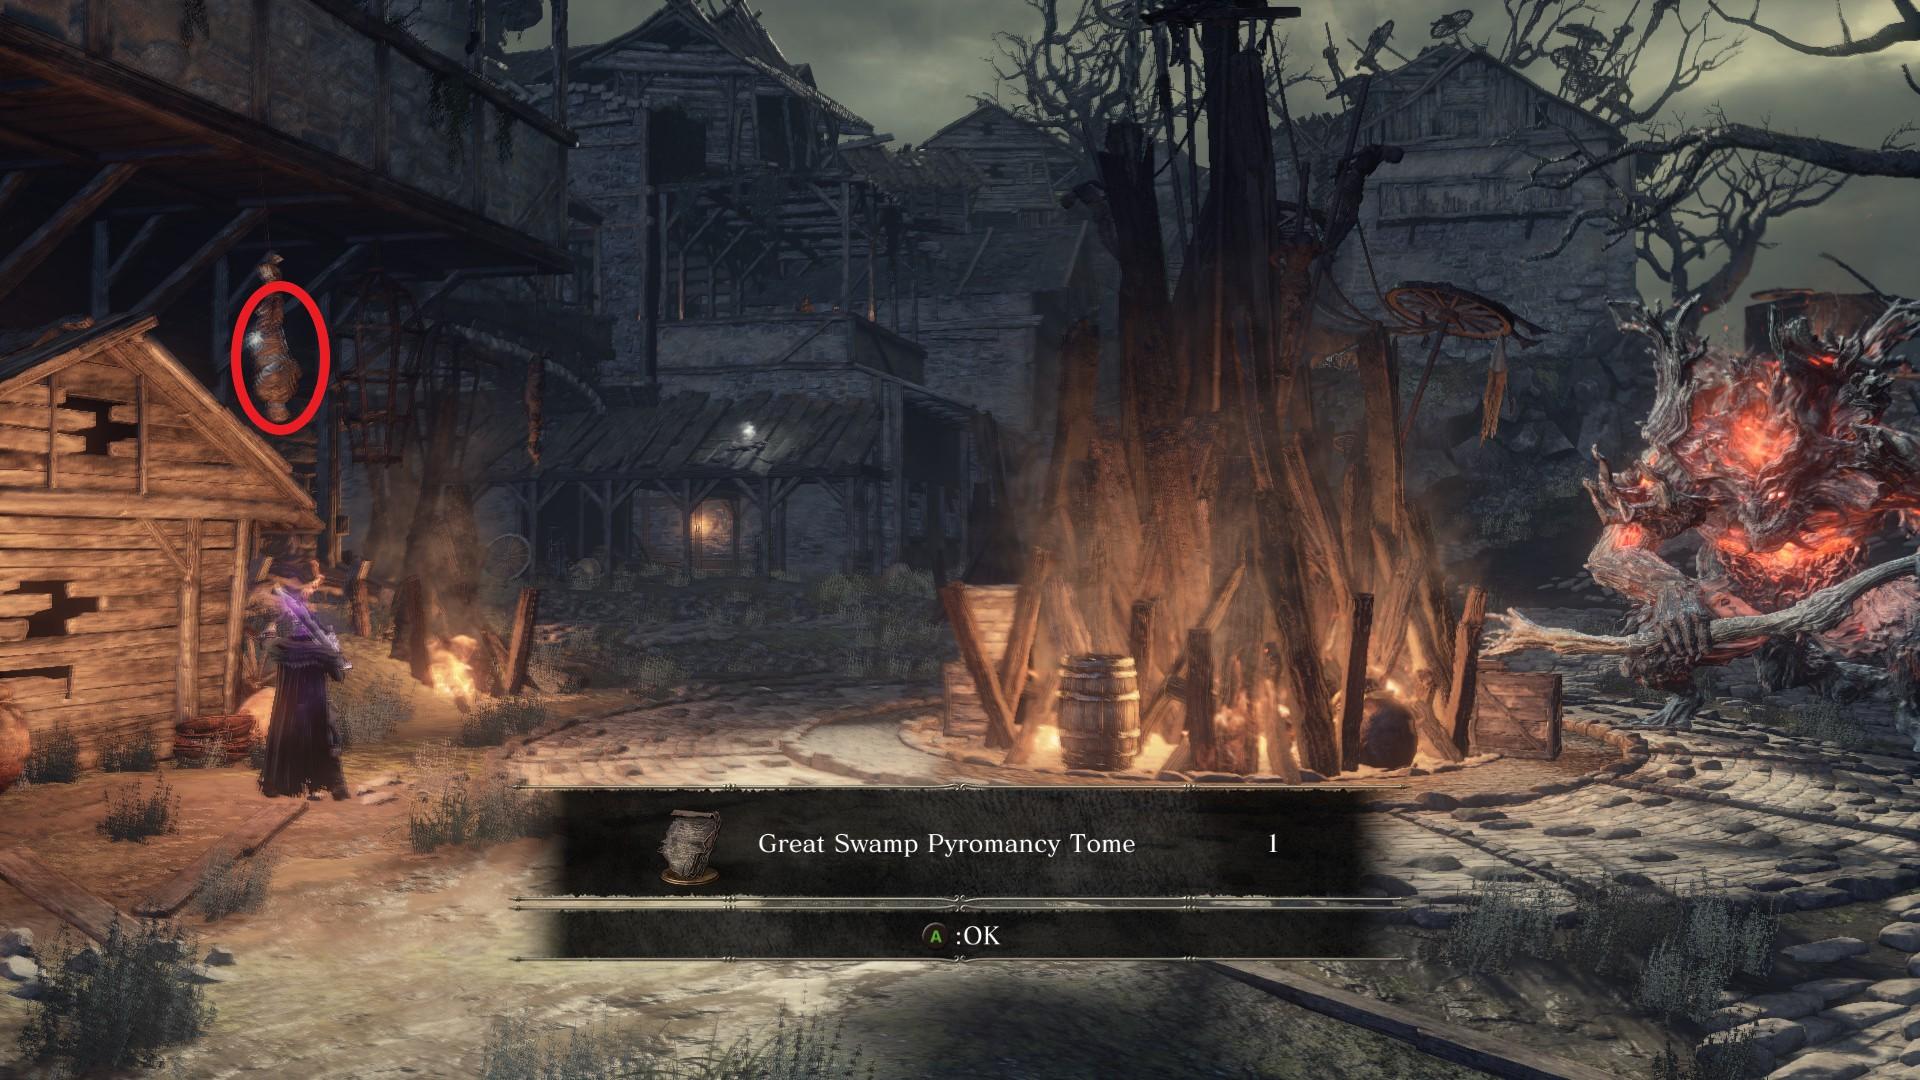 Great_Swamp_Pyromancy_Tome.jpg